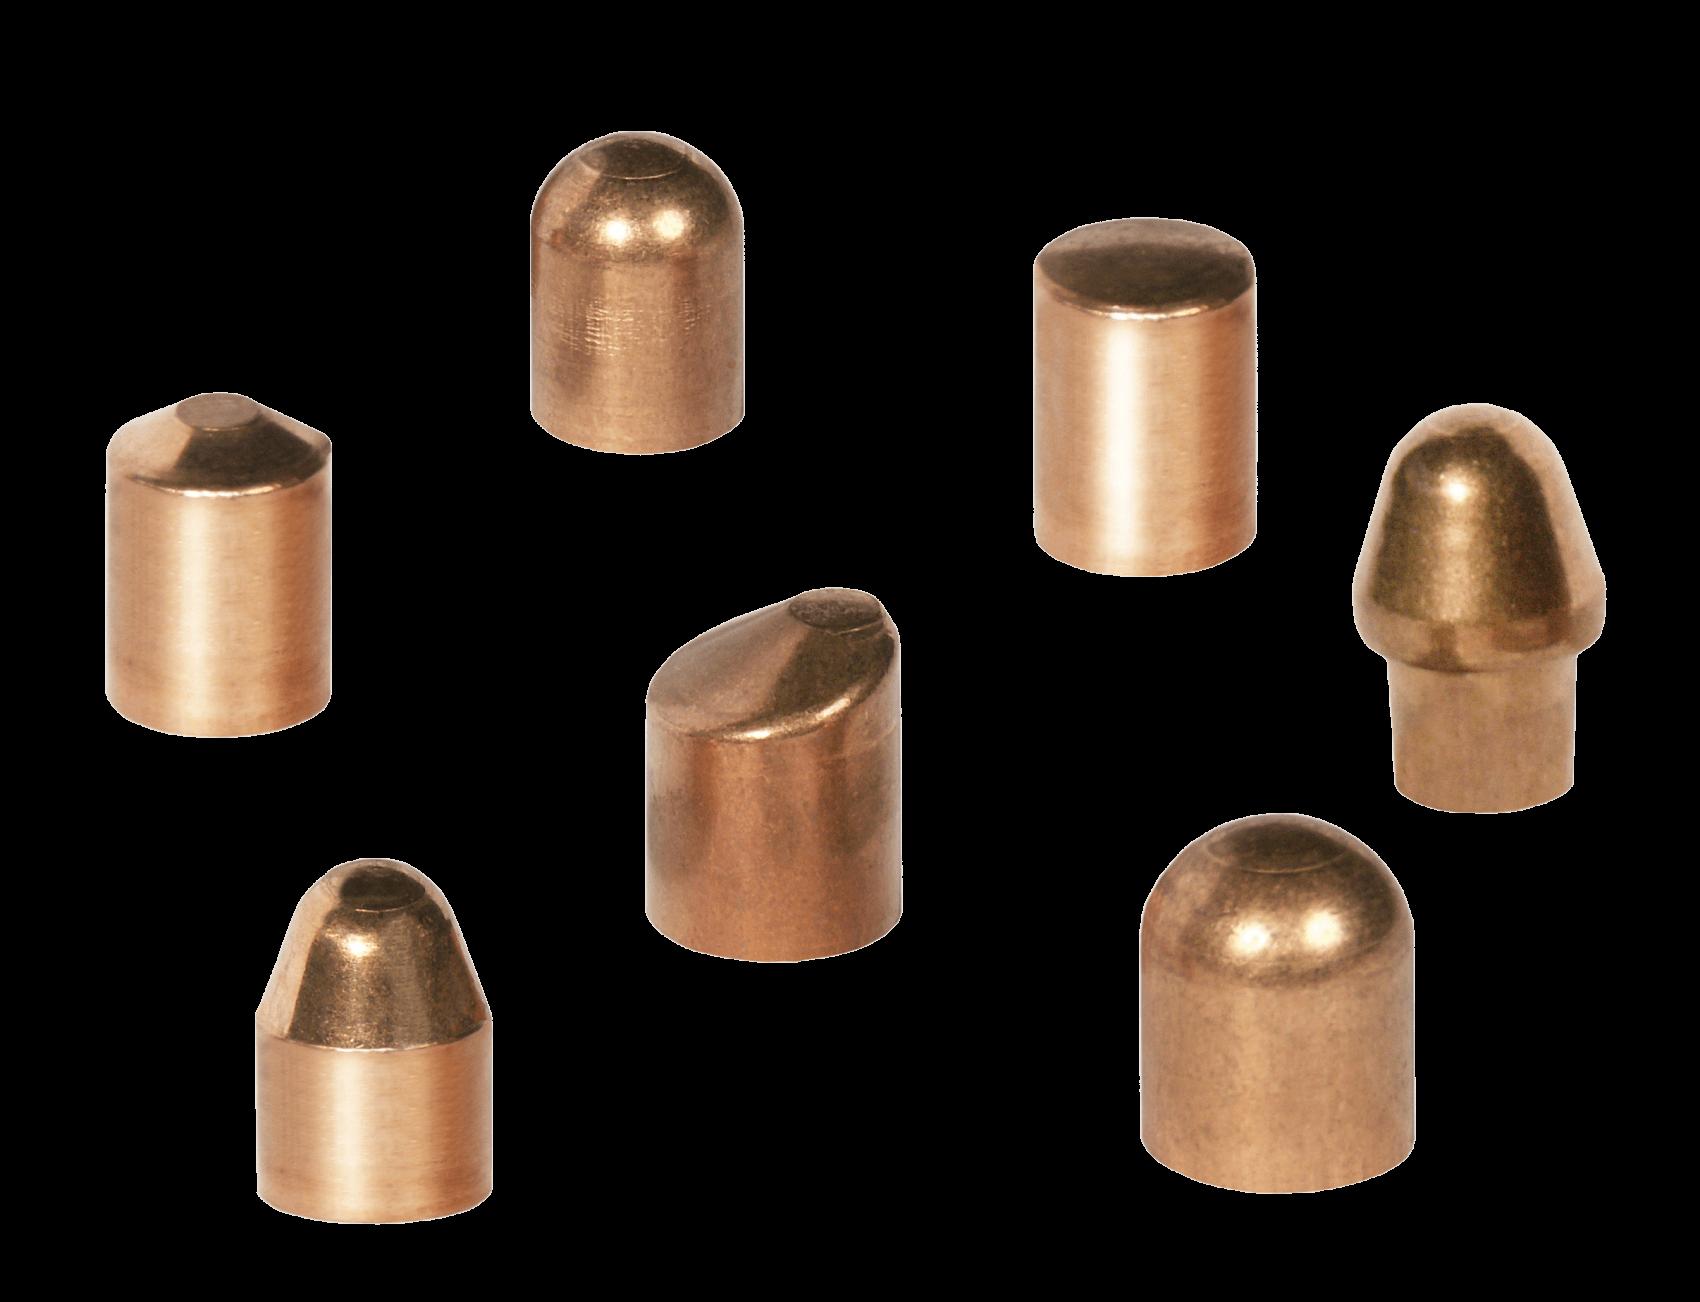 Spot welding electrode caps